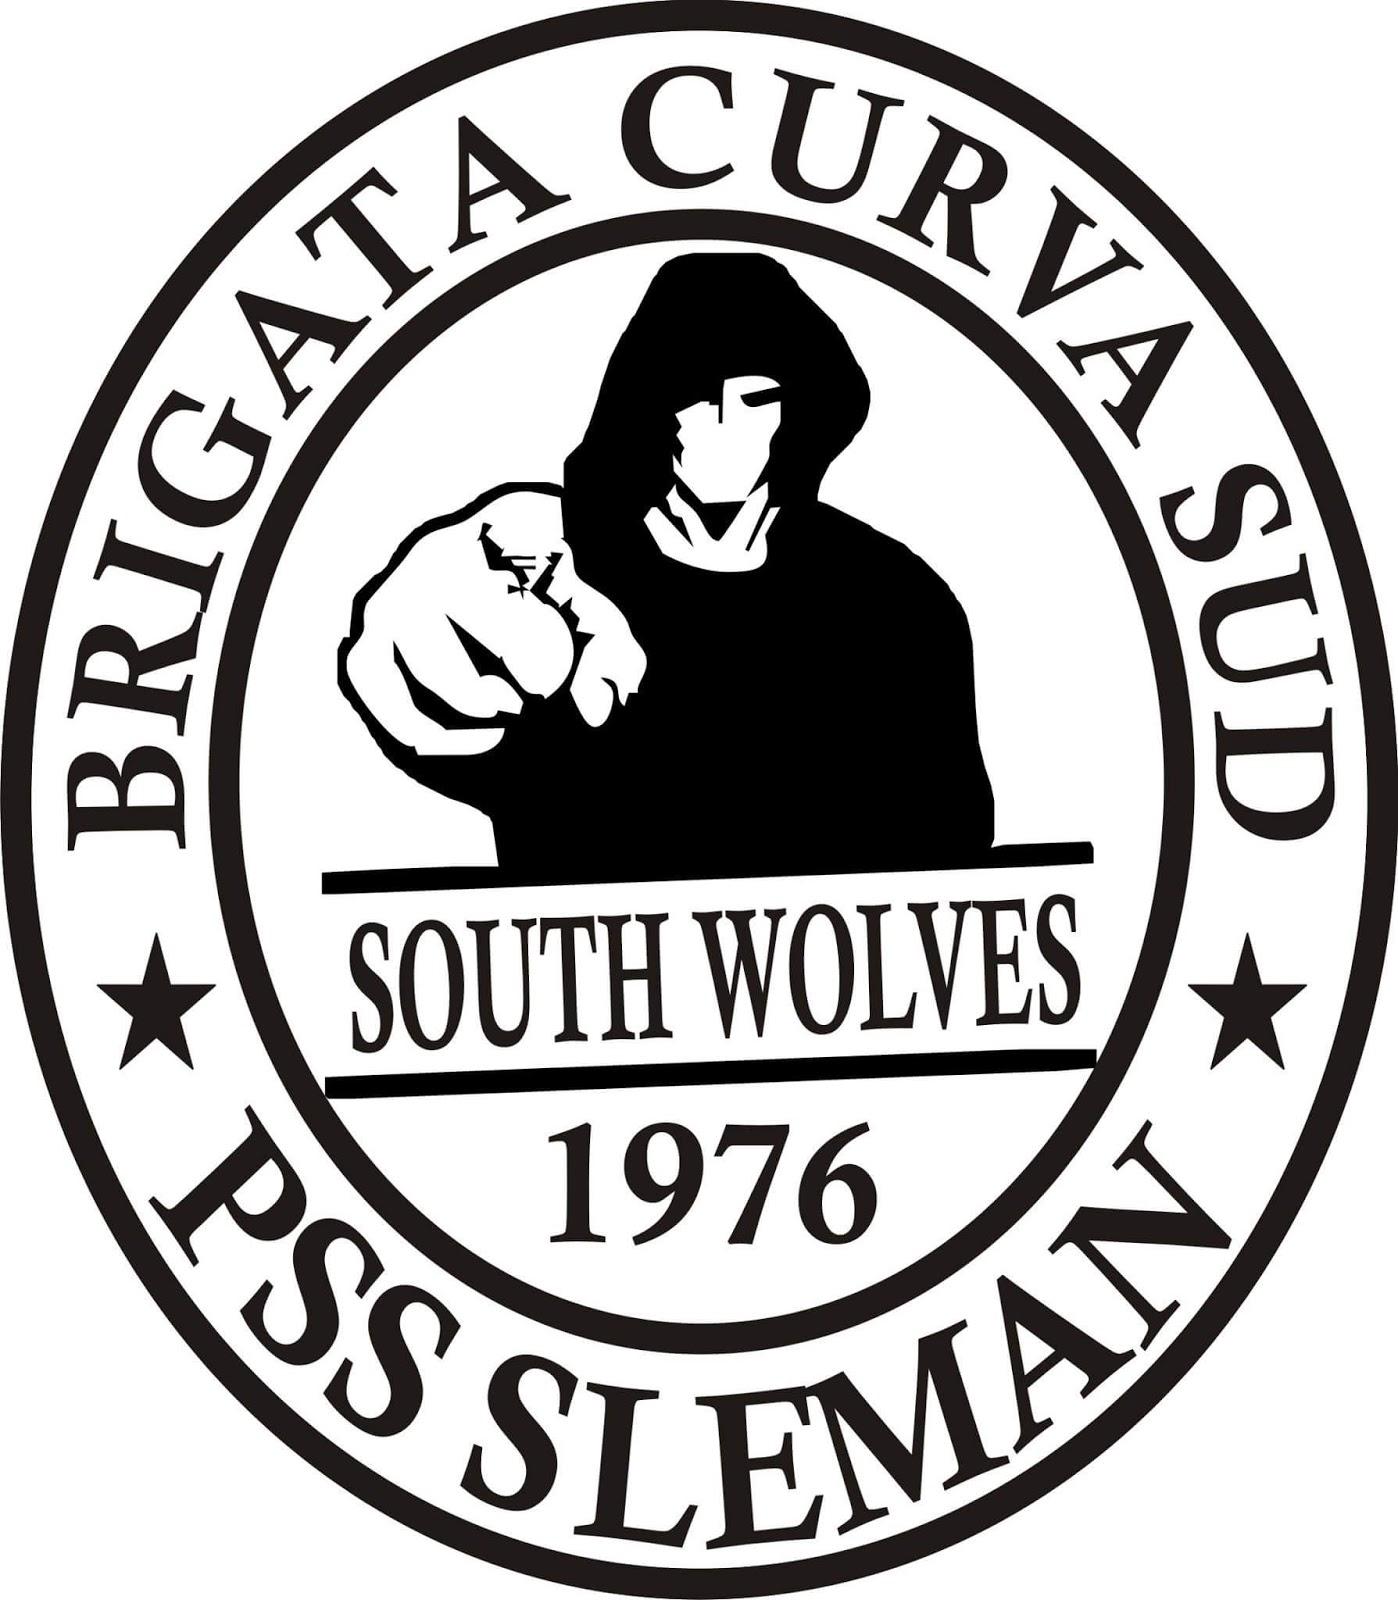 Ultras Pss Sleman Logo